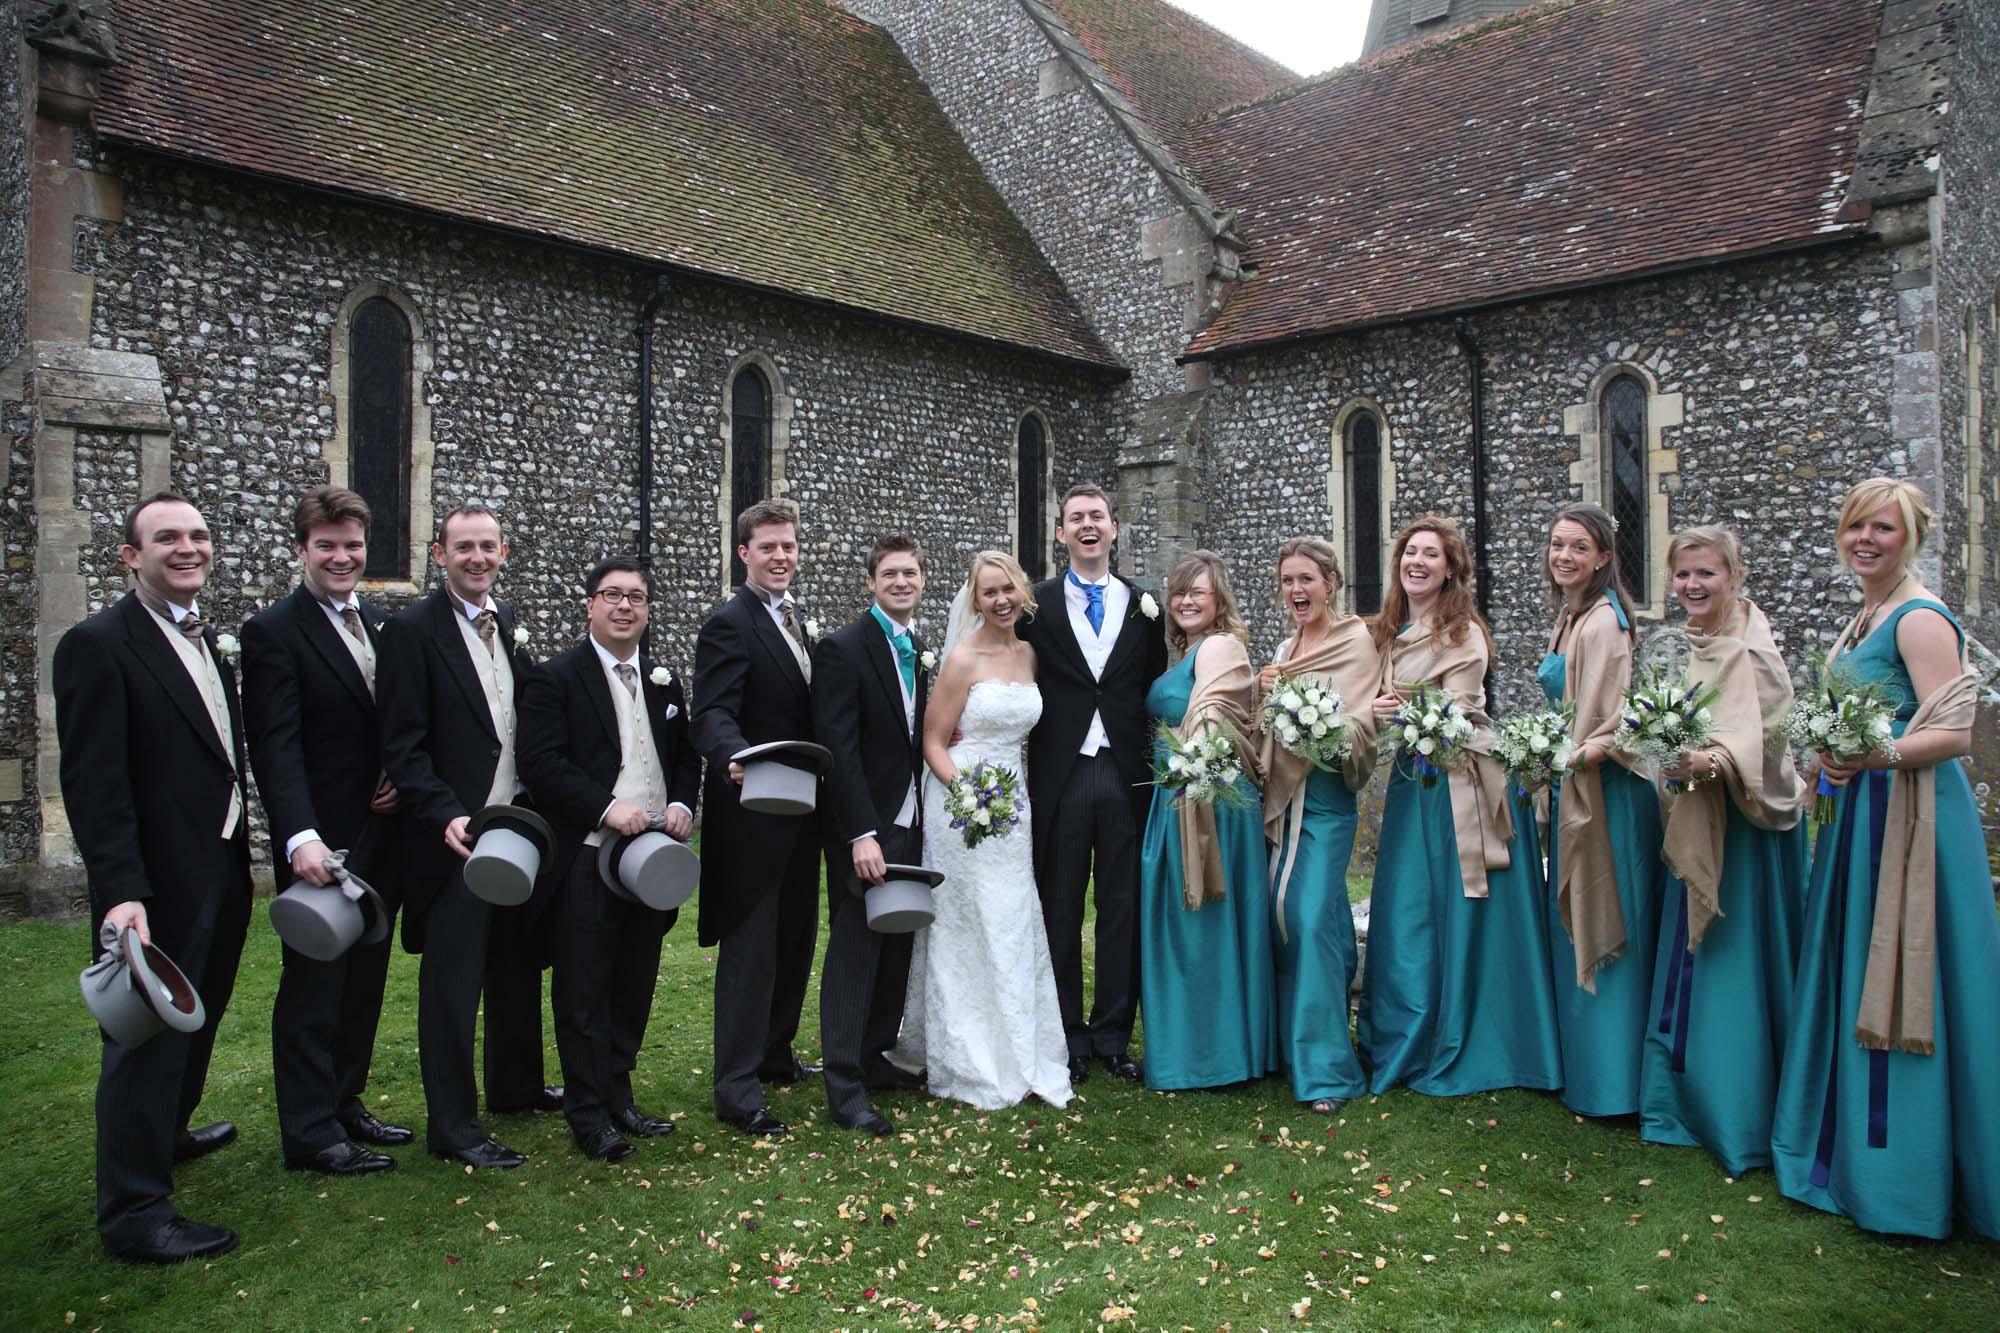 weddings-couples-love-photographer-oxford-london-jonathan-self-photography-52.jpg